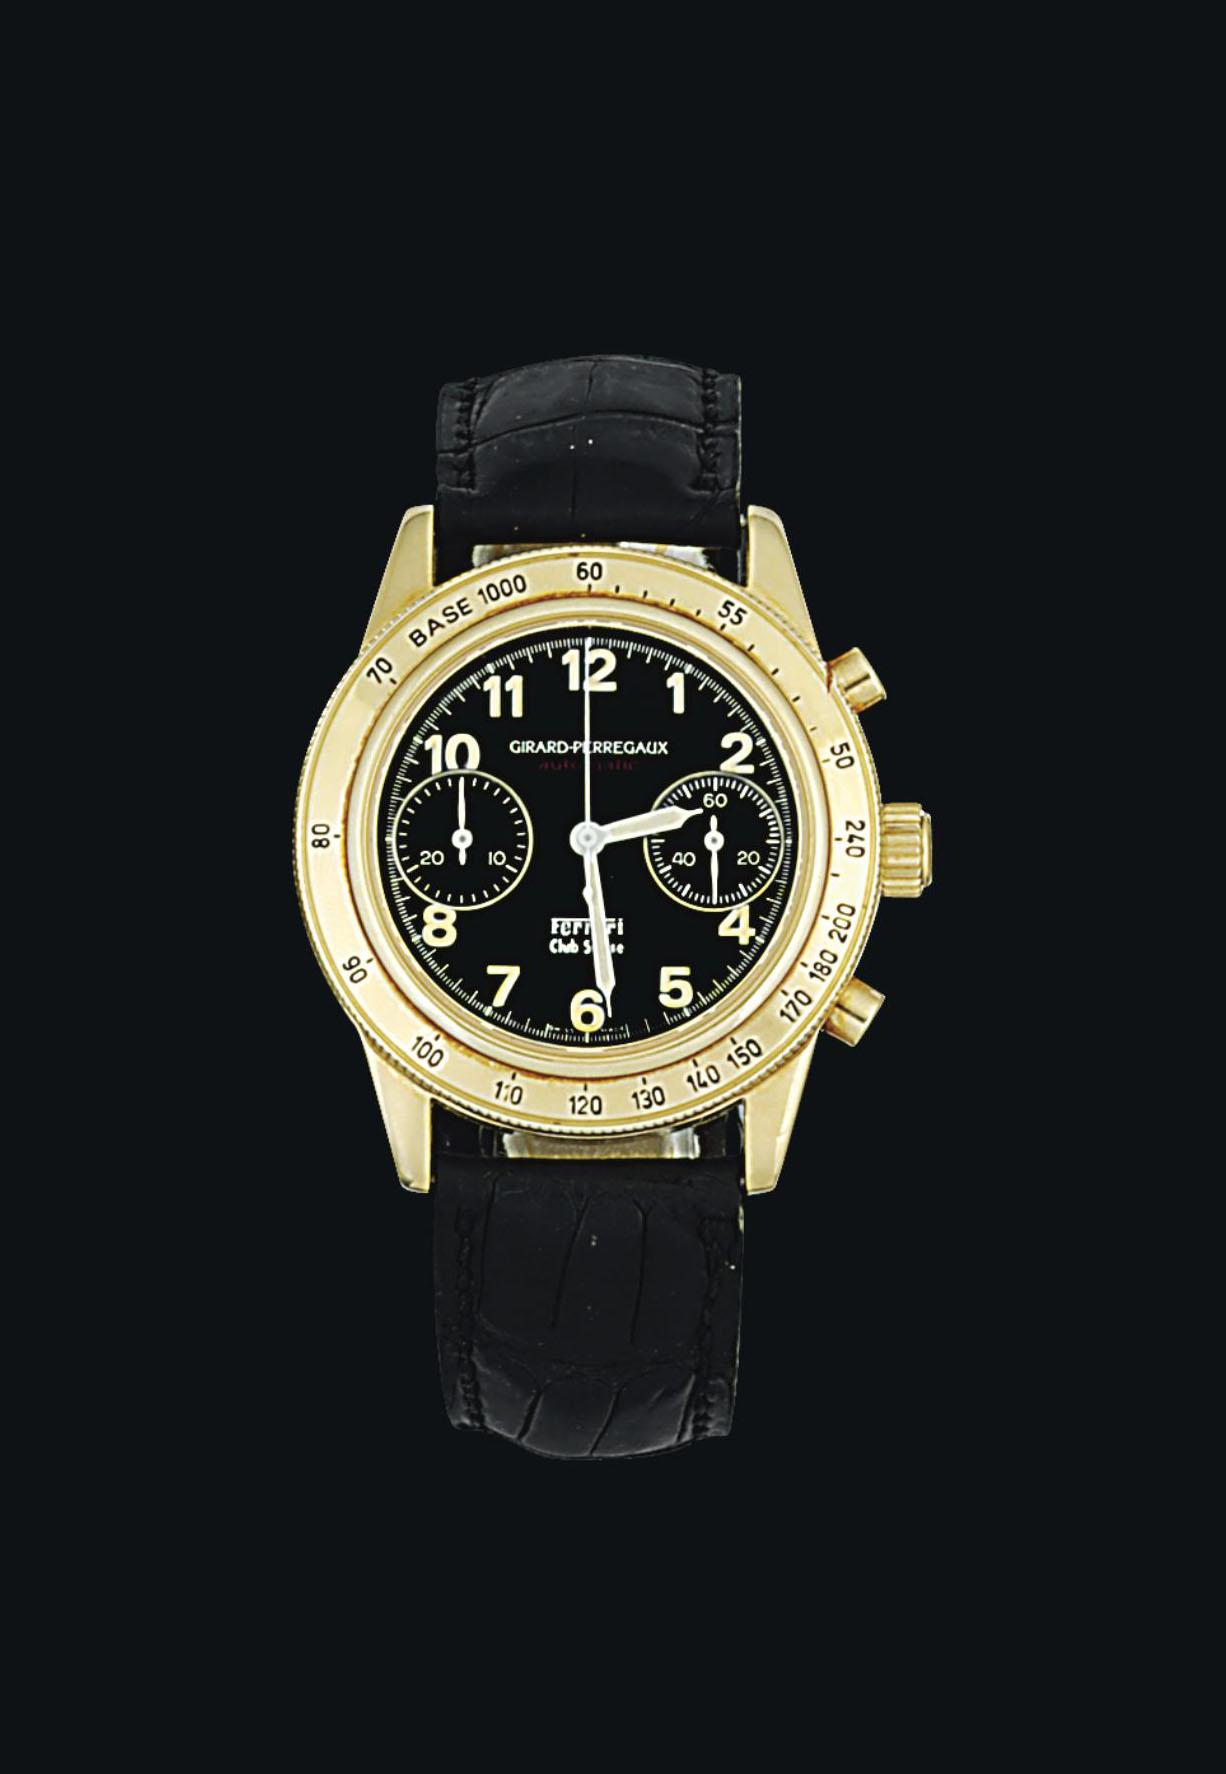 An 18ct gold automatic chronog